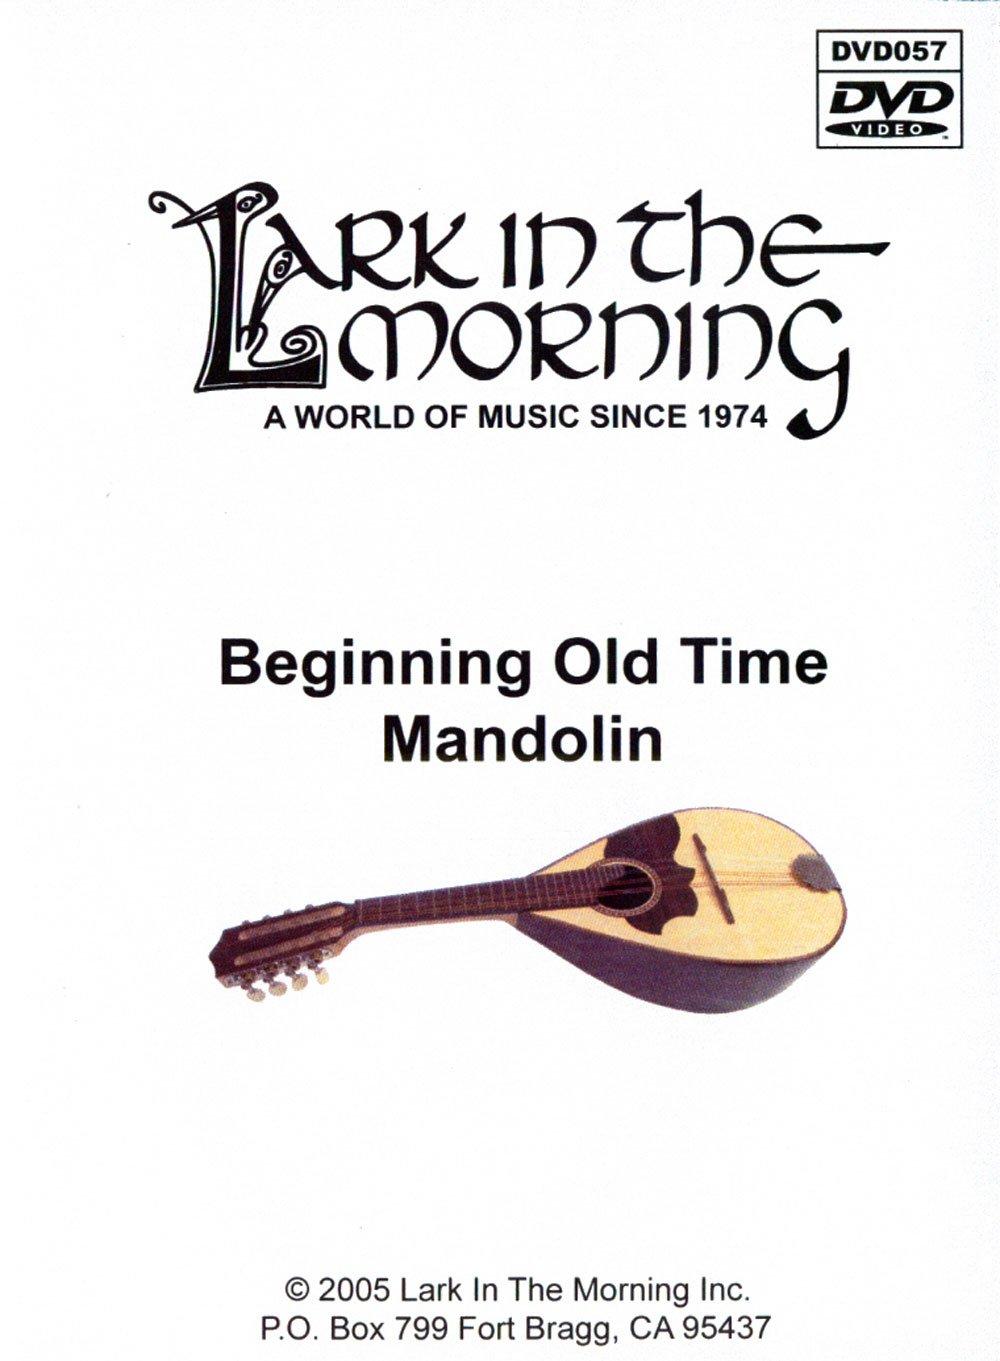 Beginning Old Time Mandolin by Mel Bay